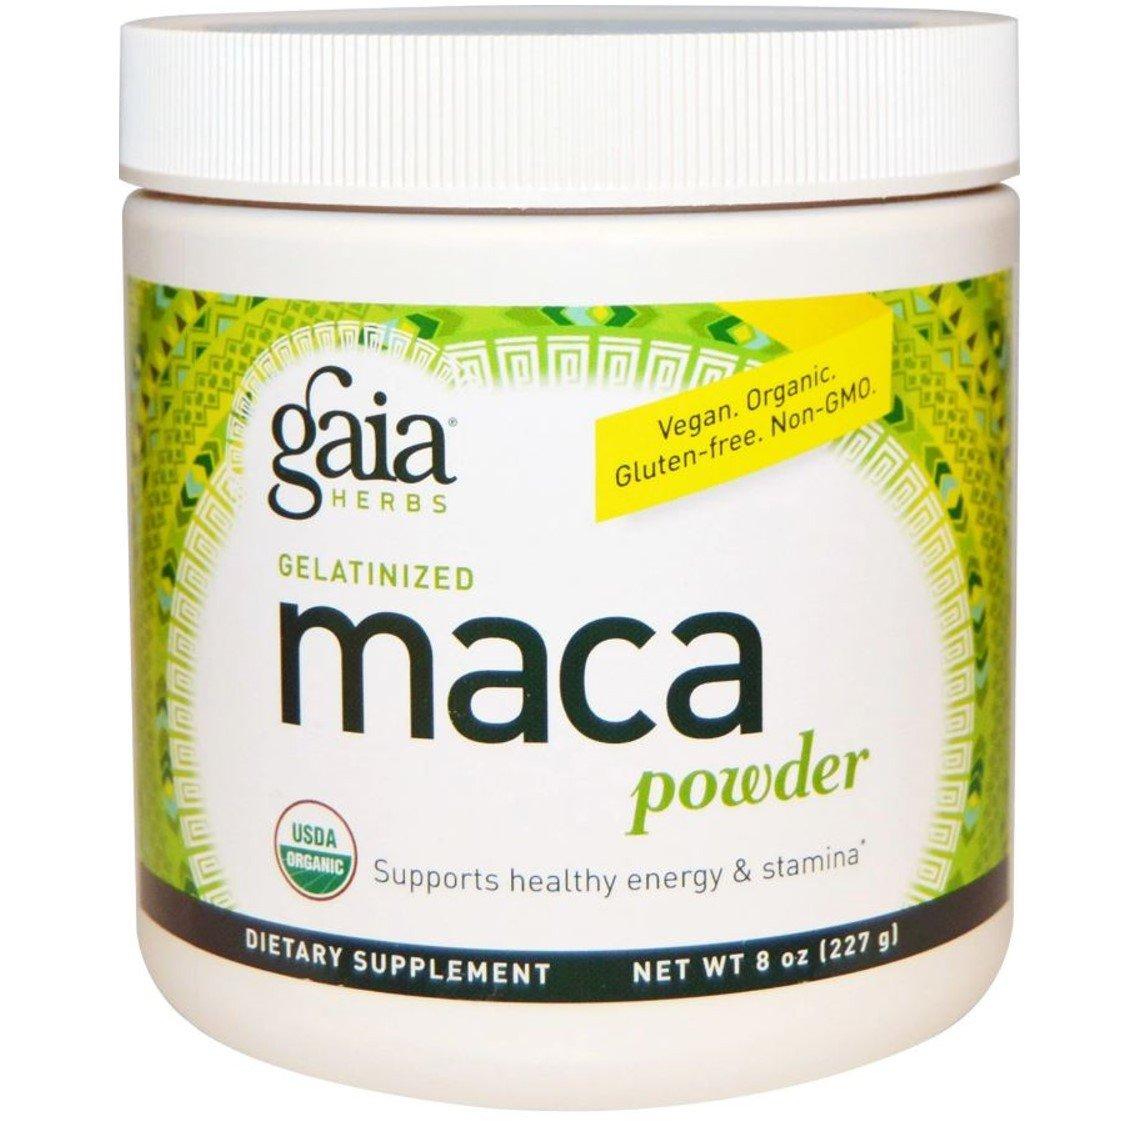 Gaia Herbs Organic Gelatinized Maca Powder, 227g